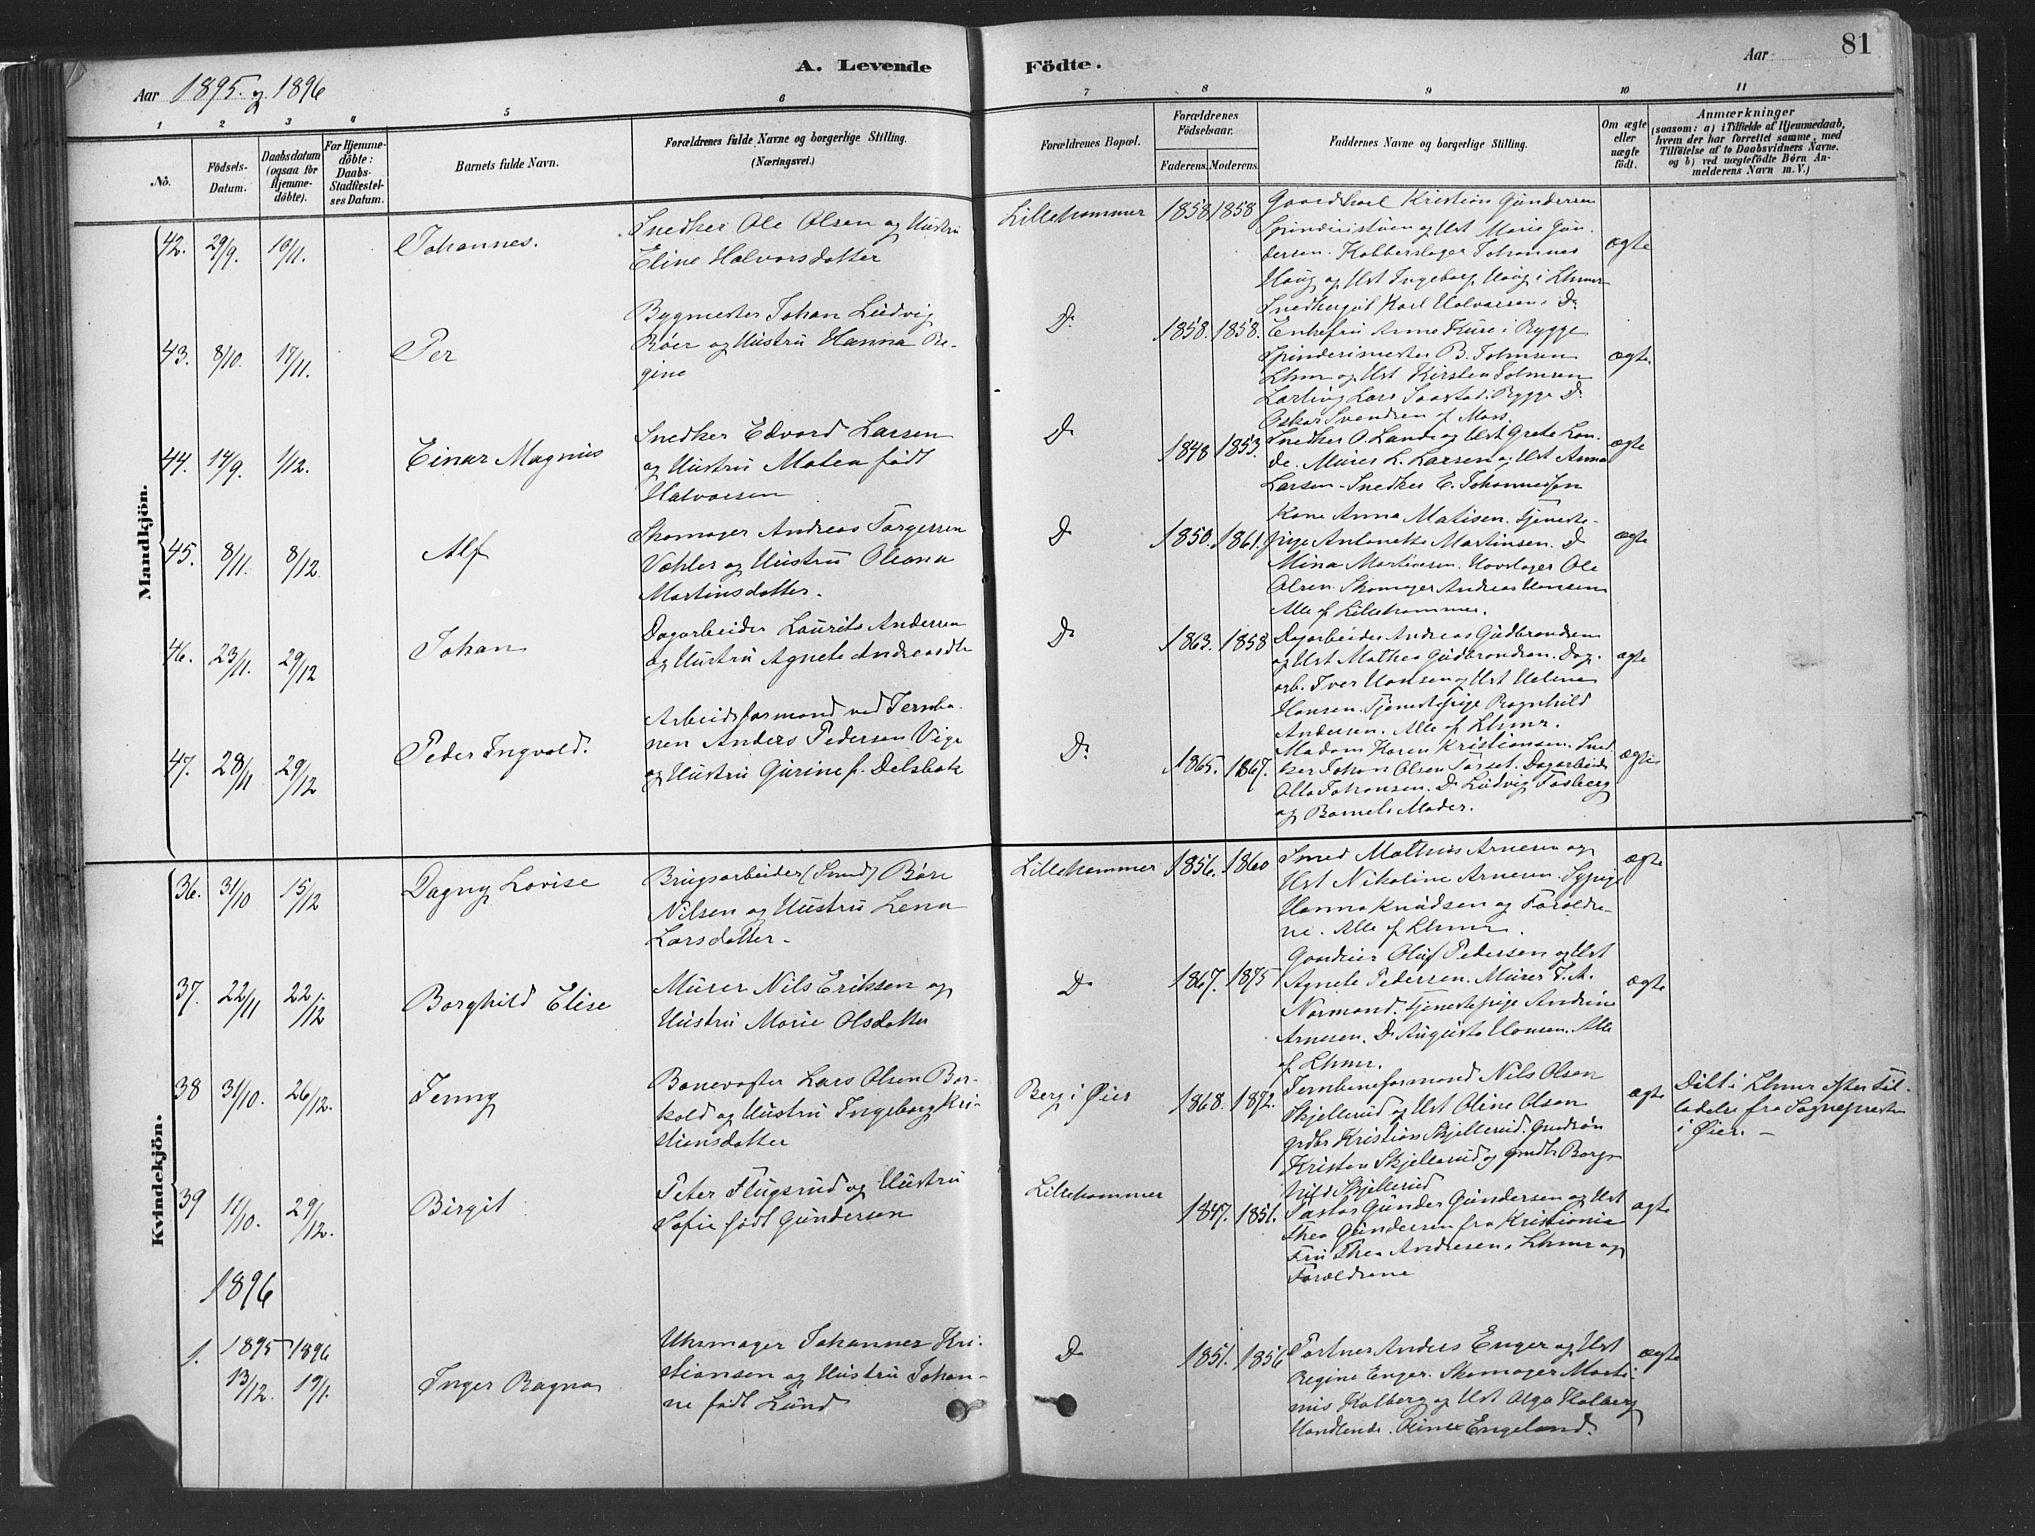 SAH, Fåberg prestekontor, Ministerialbok nr. 10, 1879-1900, s. 81